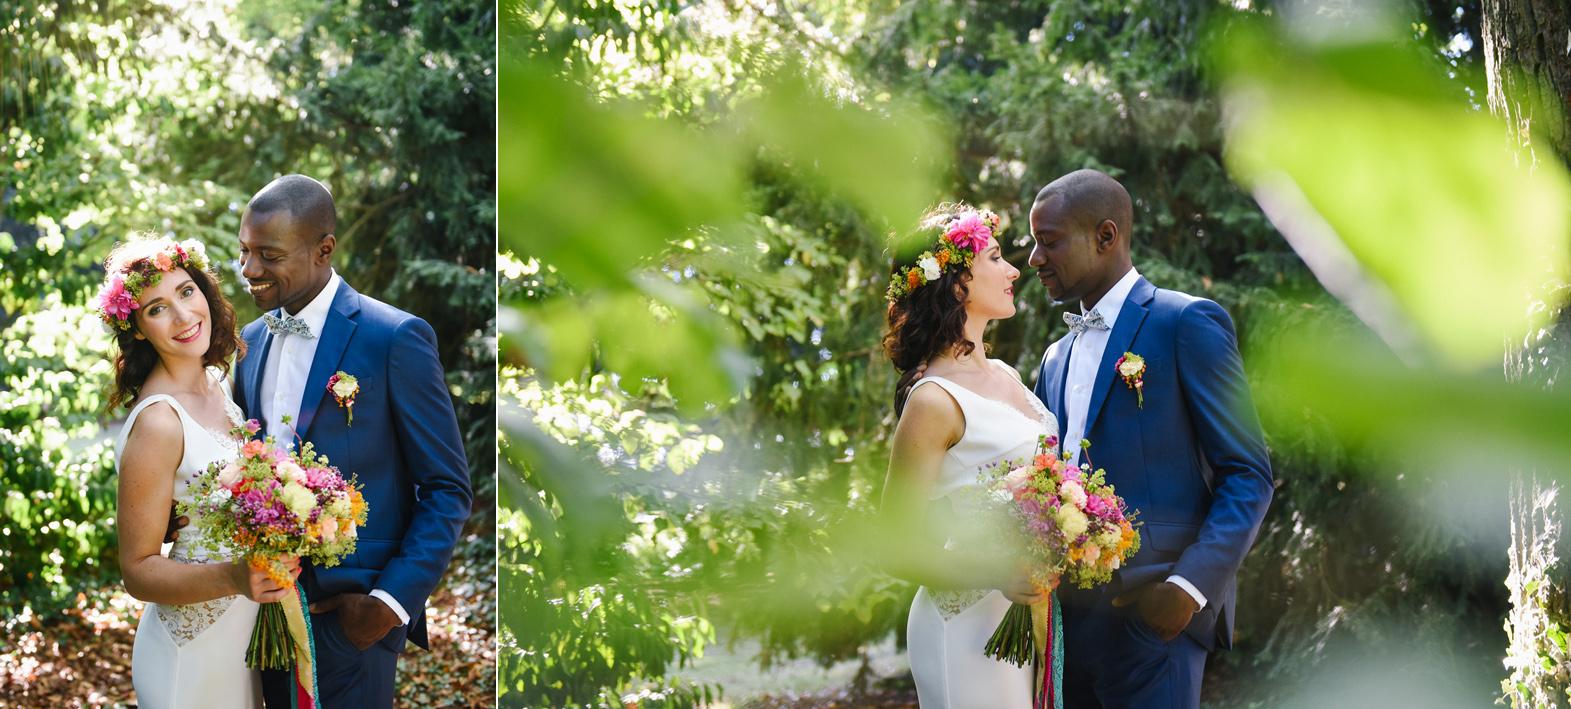 shooting_inspiration_mariage_peps_wedding_95_photographe_clemence_dubois-mep